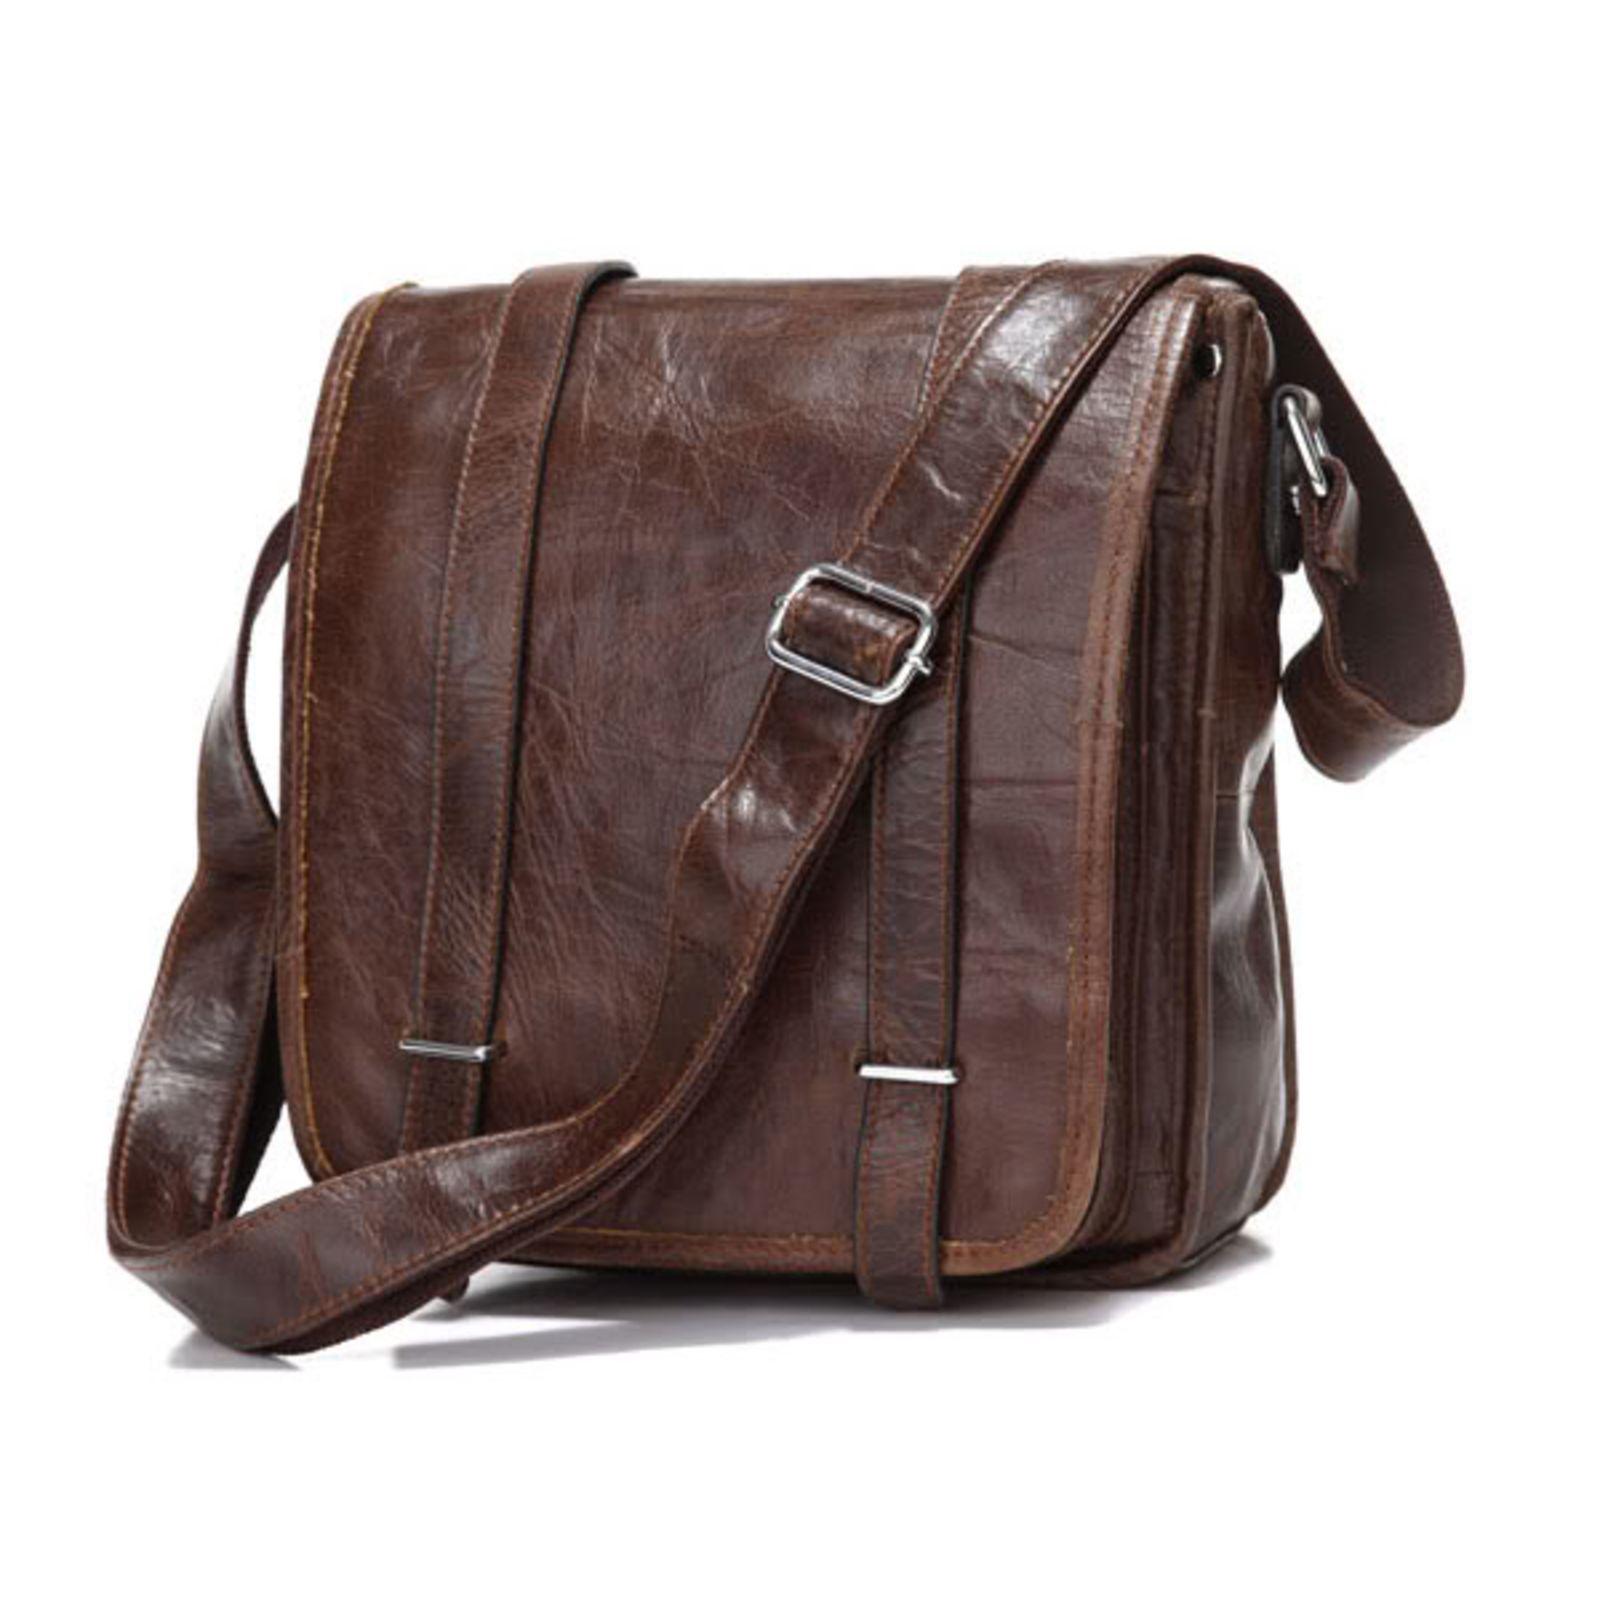 Brown Tenor Multi-Purpose Leather Case Delton Bags zssUa2dU